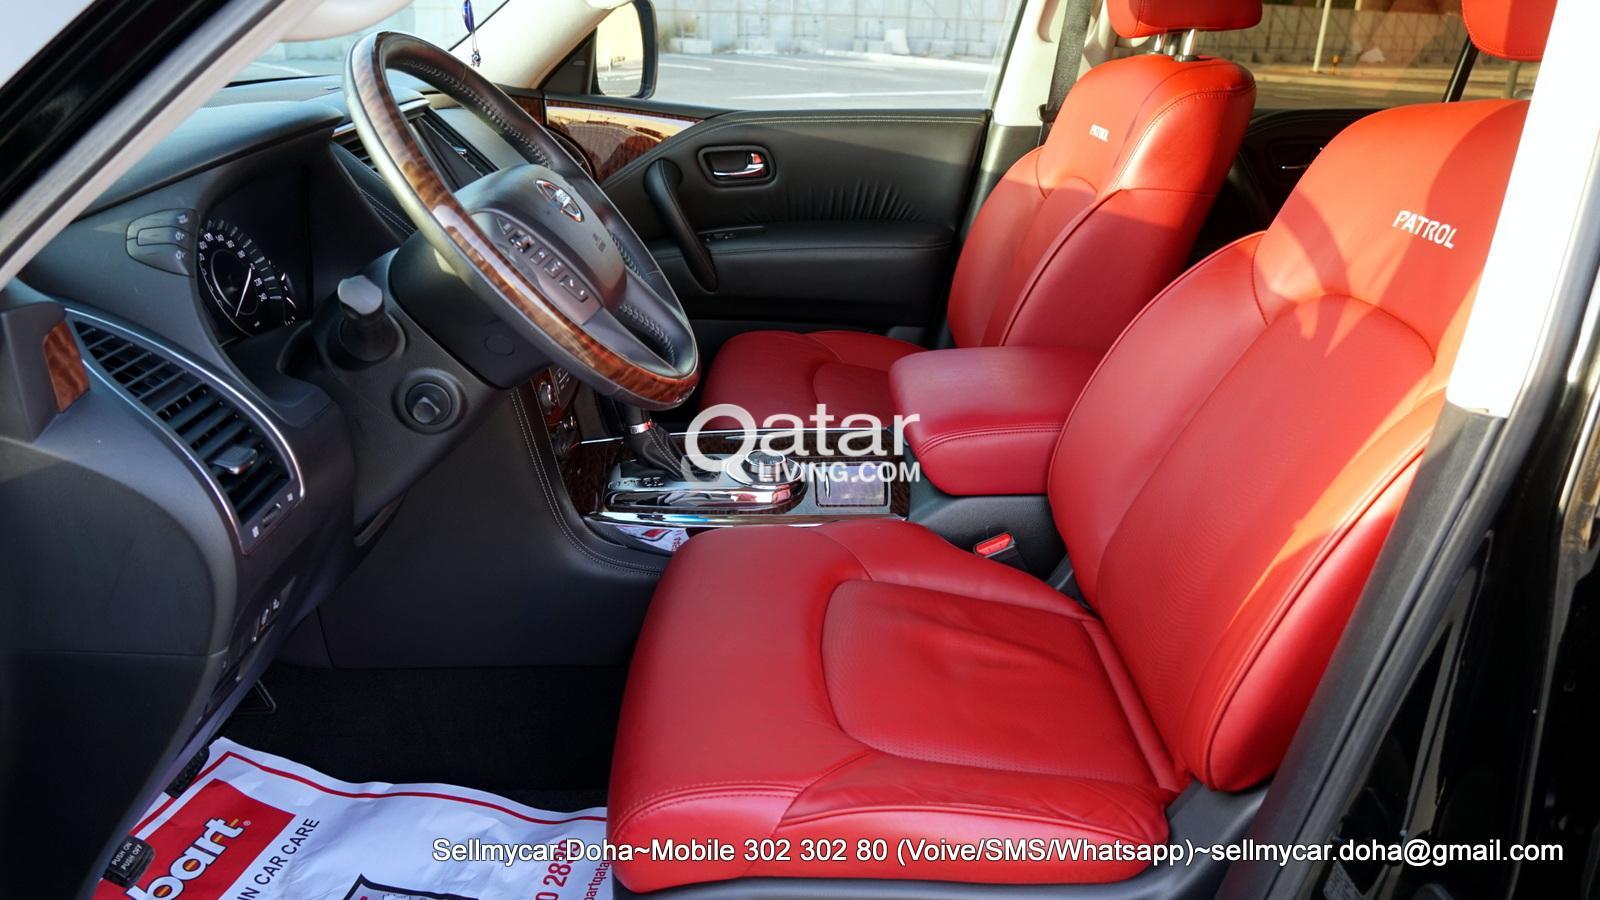 2014 Nissan Patrol Limited Edition VVEL DIG (Rare)